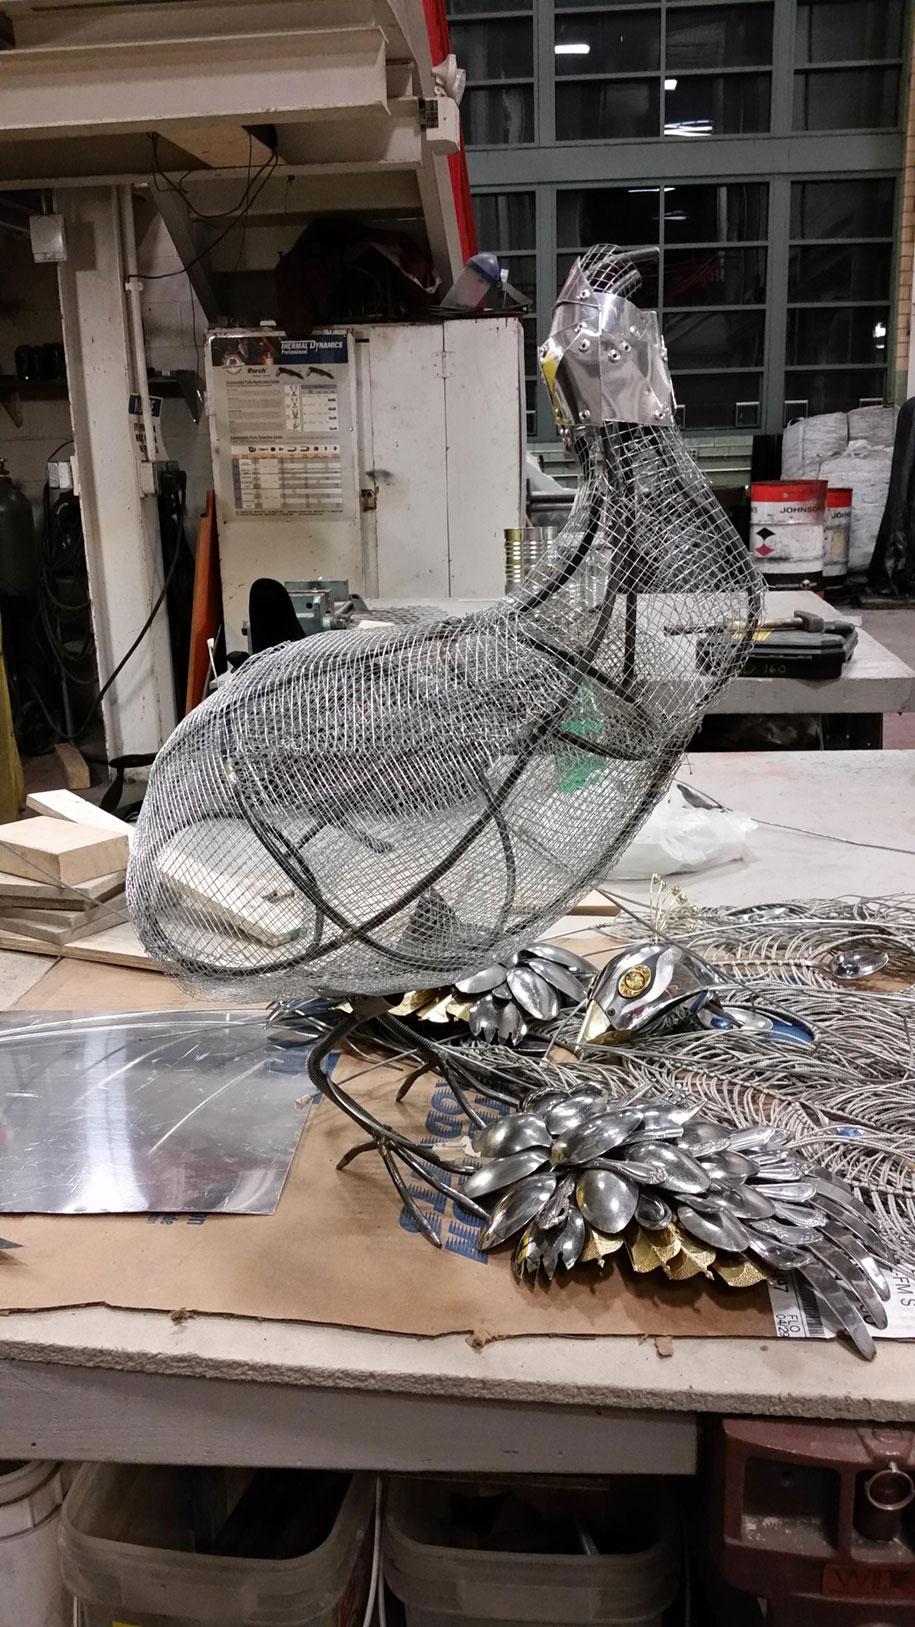 found-object-sculpture-metal-peacock-liddlenomnom-39